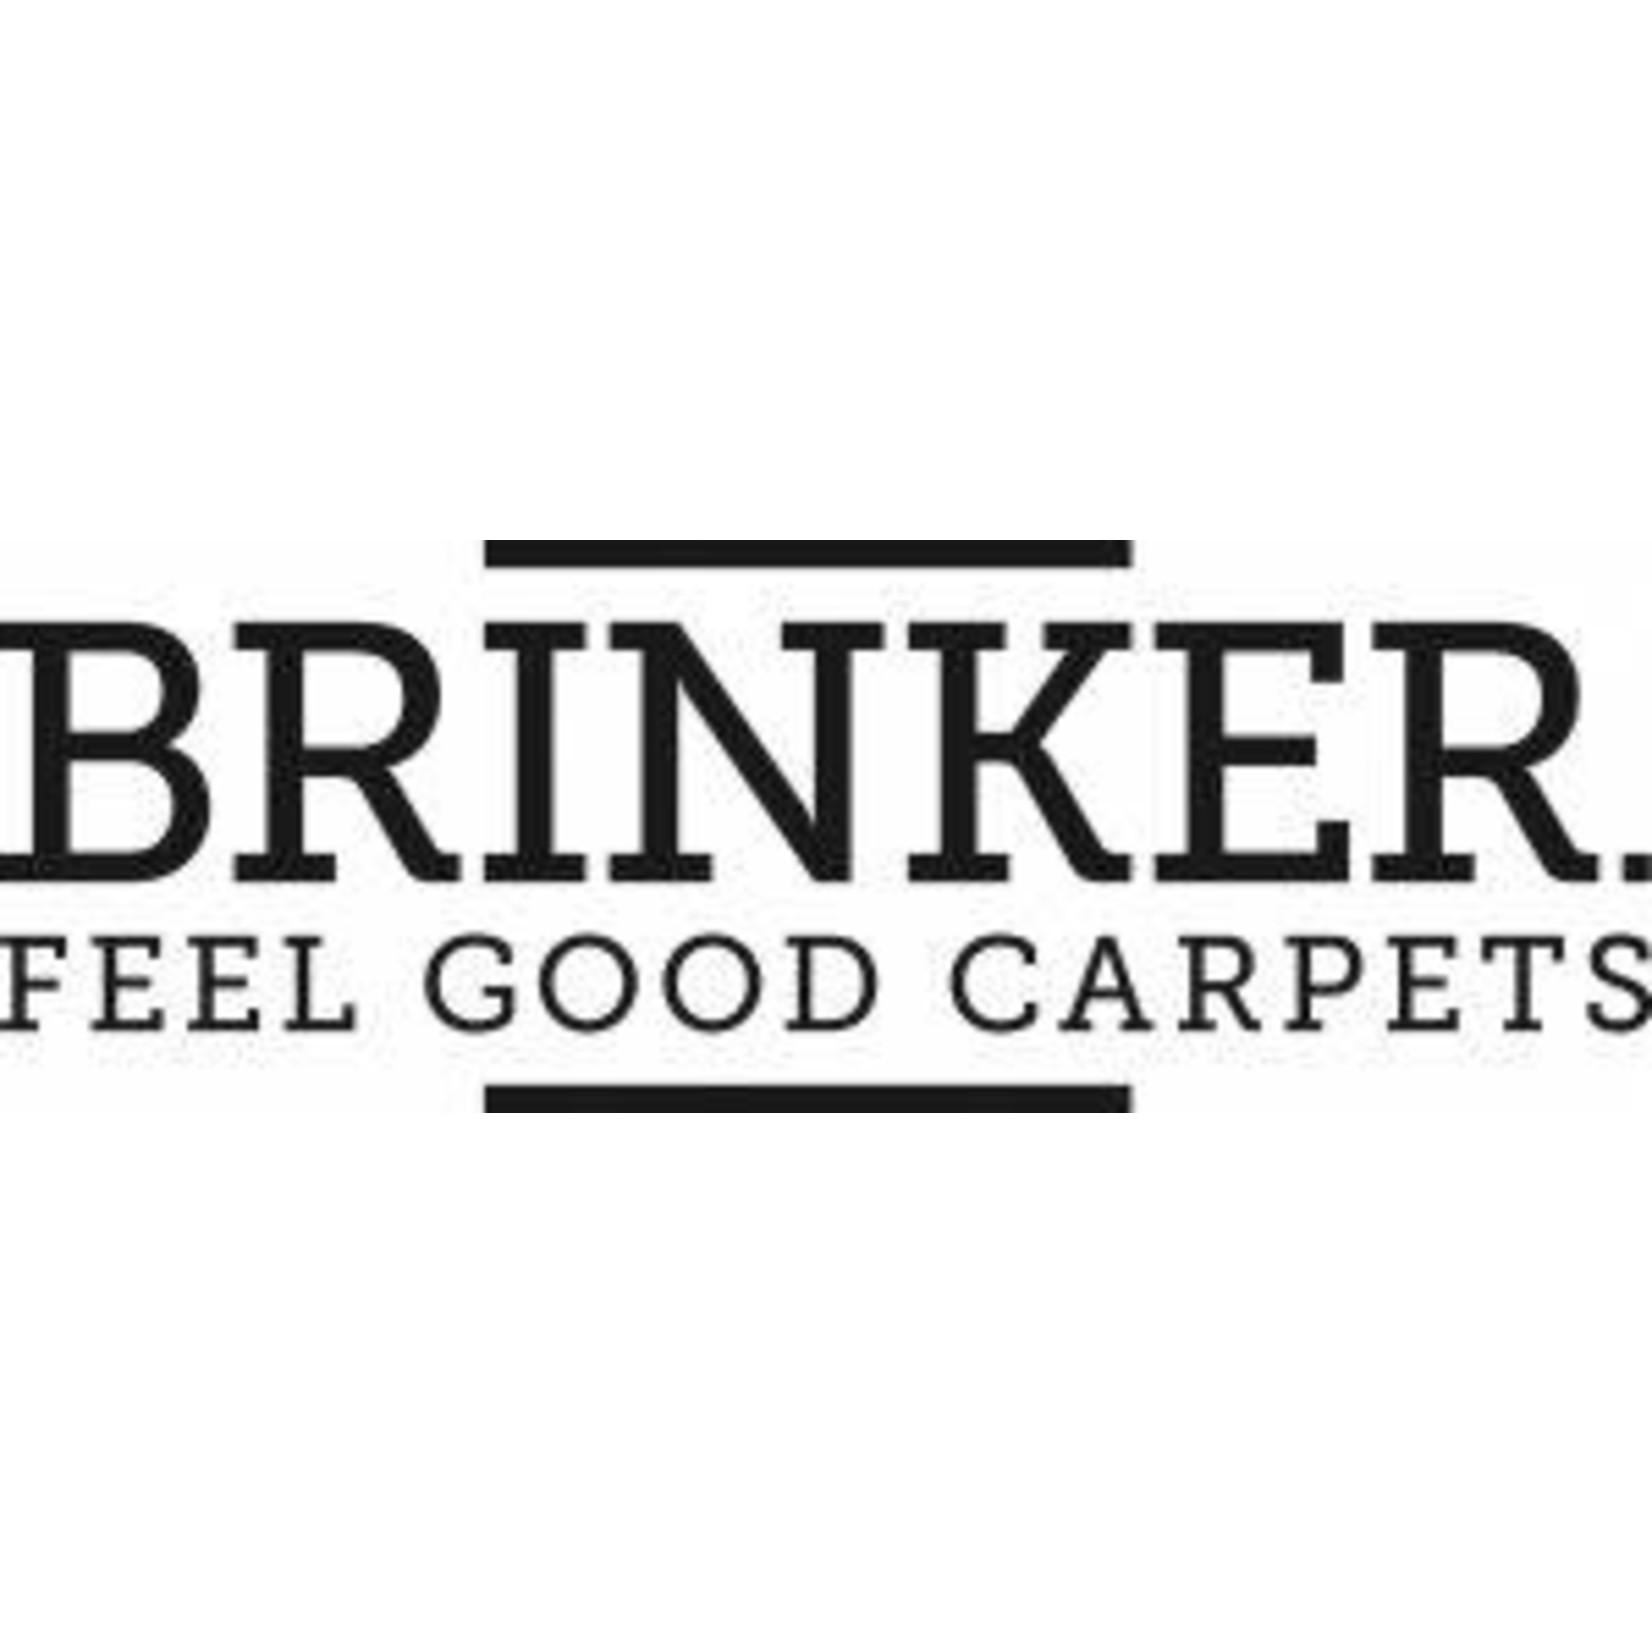 Brinker Carpets Brinker Carpets 1080 Dejavu 160x230cm